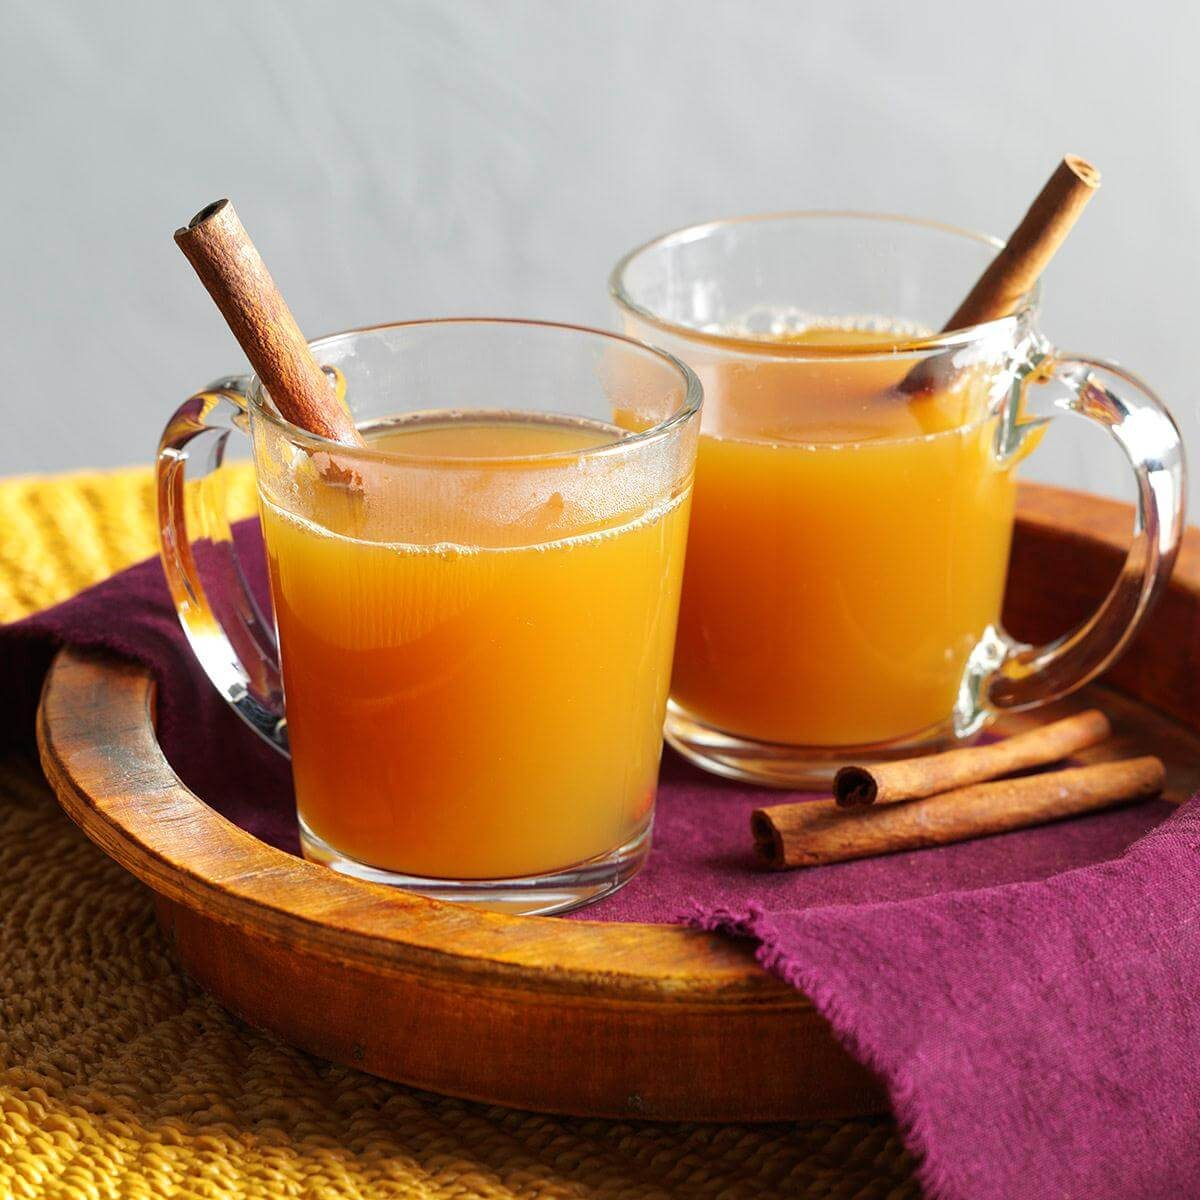 Spiced Hot Apple Cider Recipe